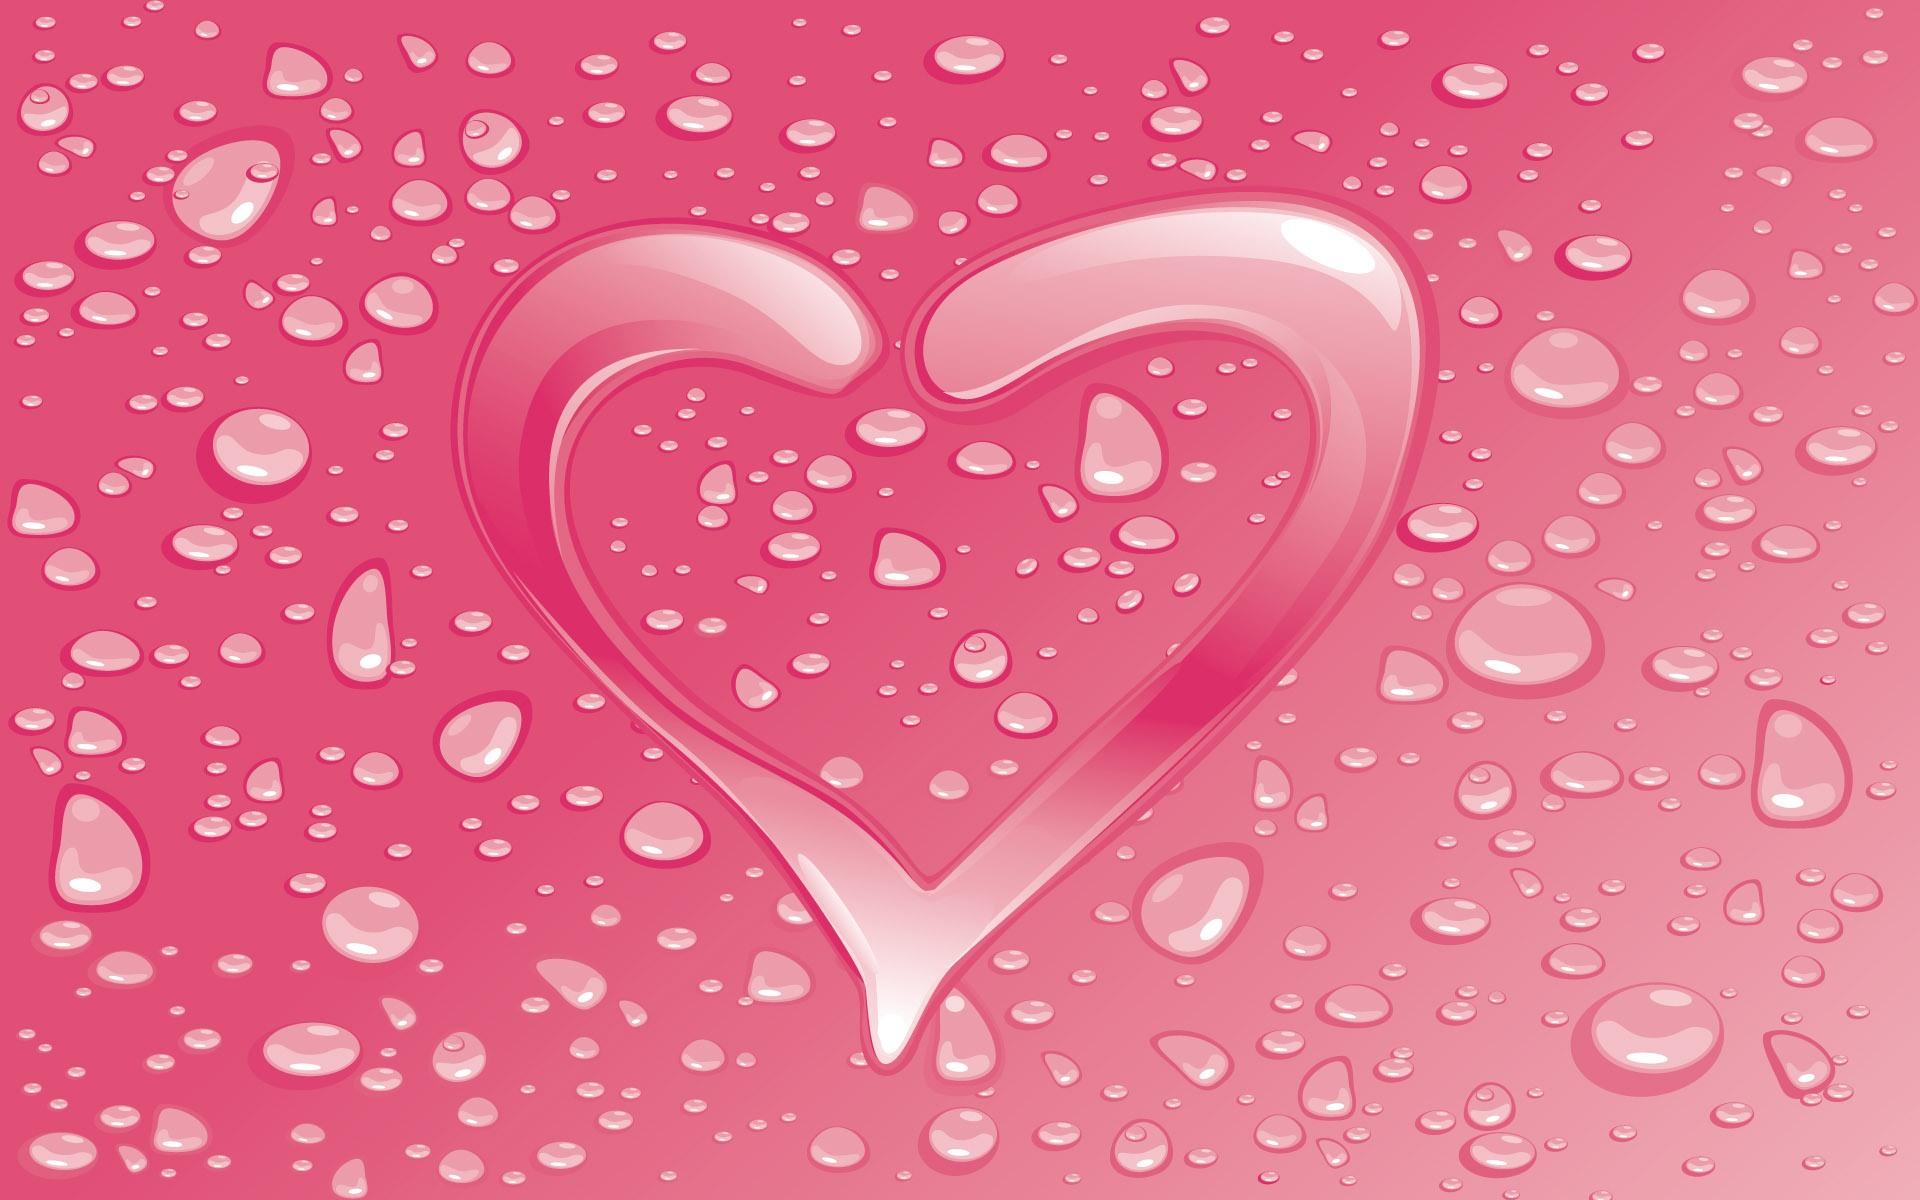 Valentines Day Heart desktop wallpaper 1920x1200